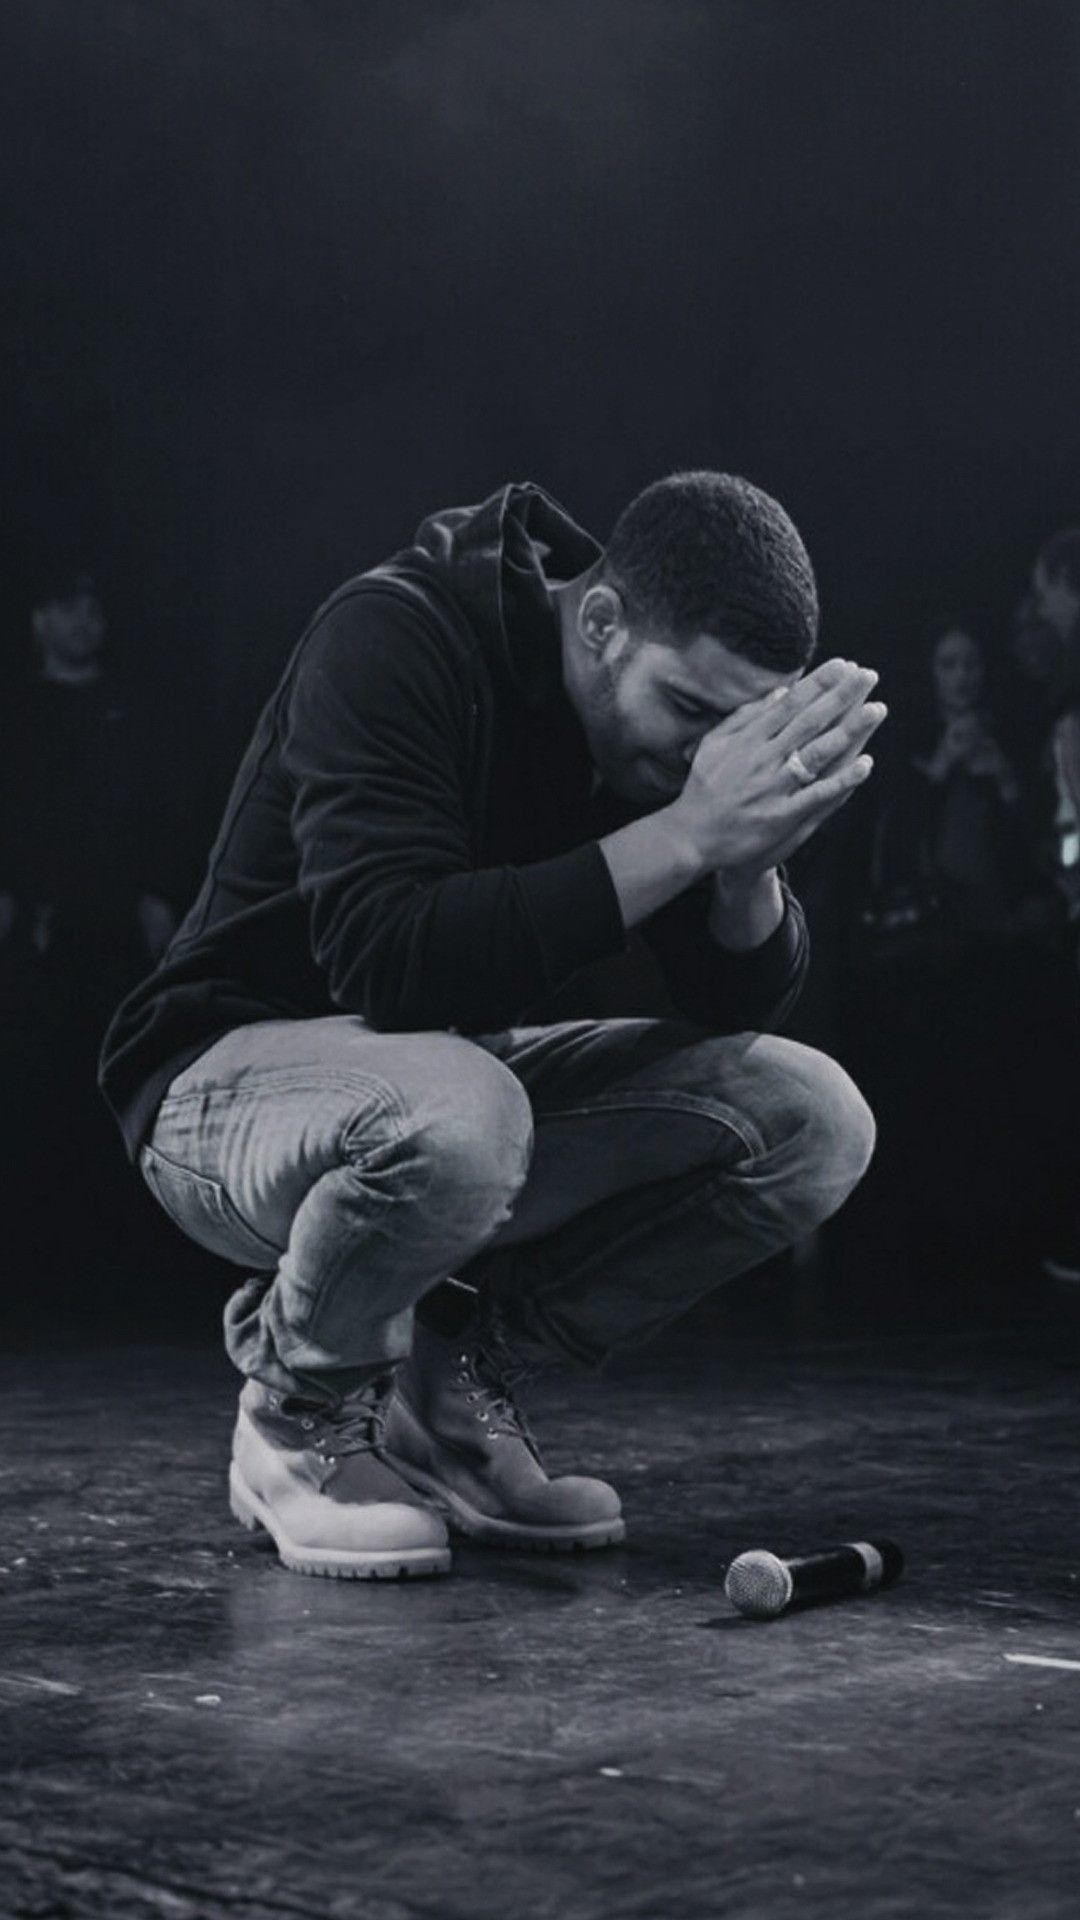 Drake Iphone Wallpaper 2016